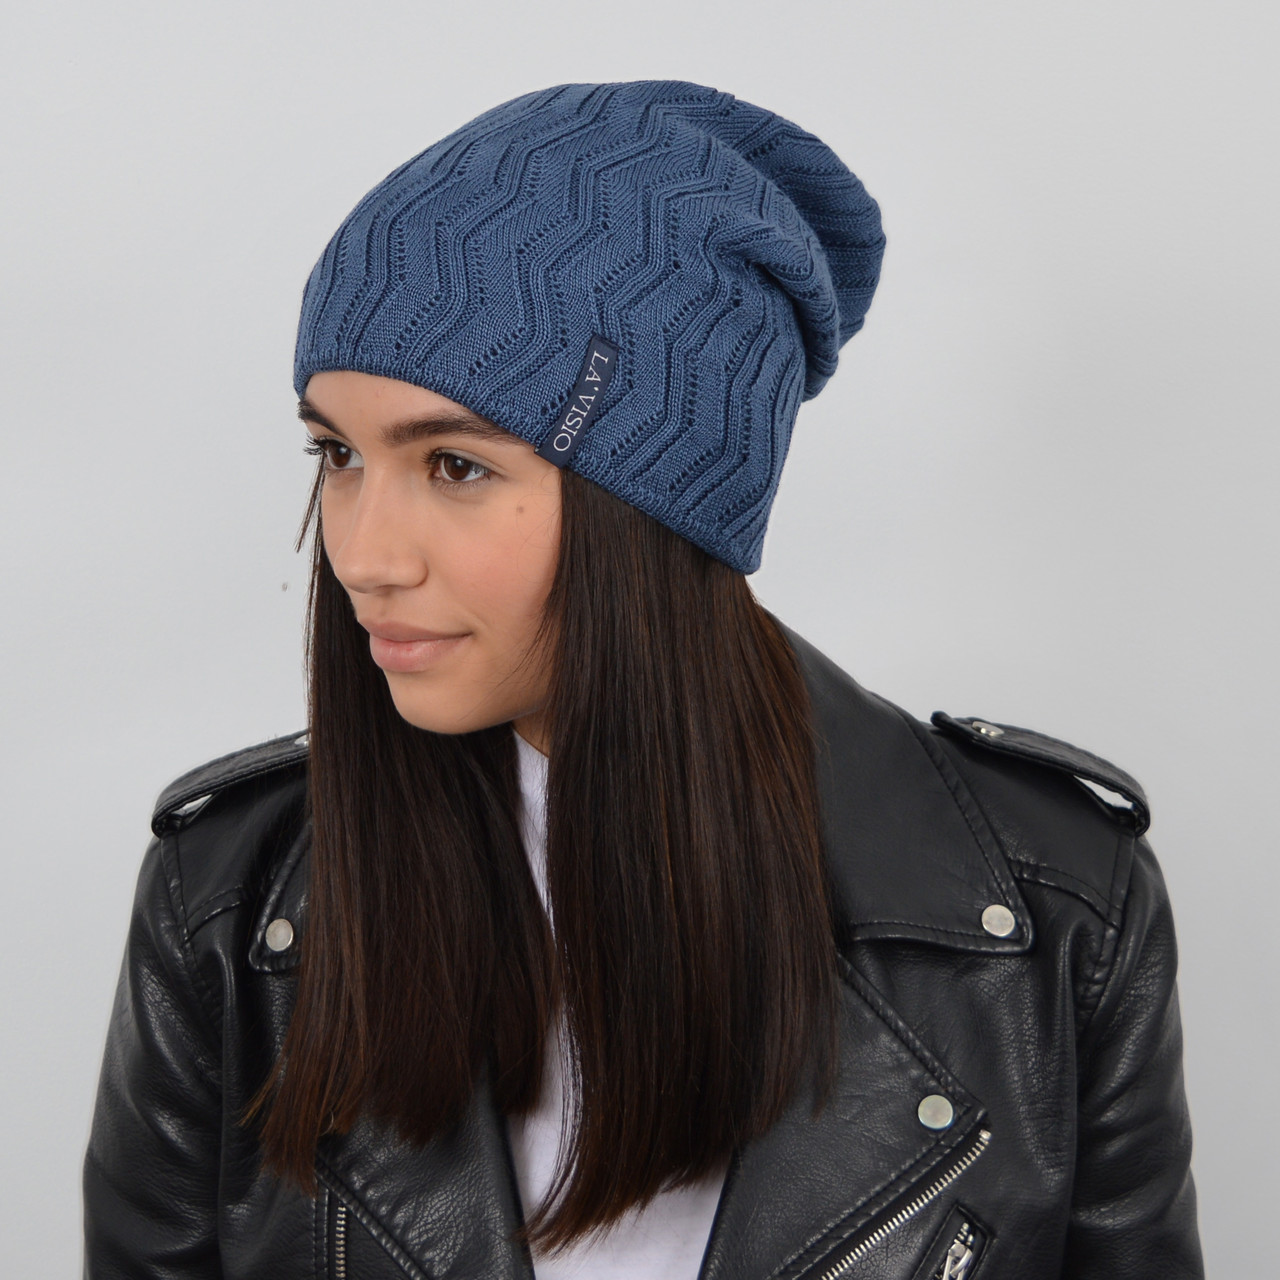 Женская шапка LaVisio (ЛаВисио) 254-219 джинс, фото 1